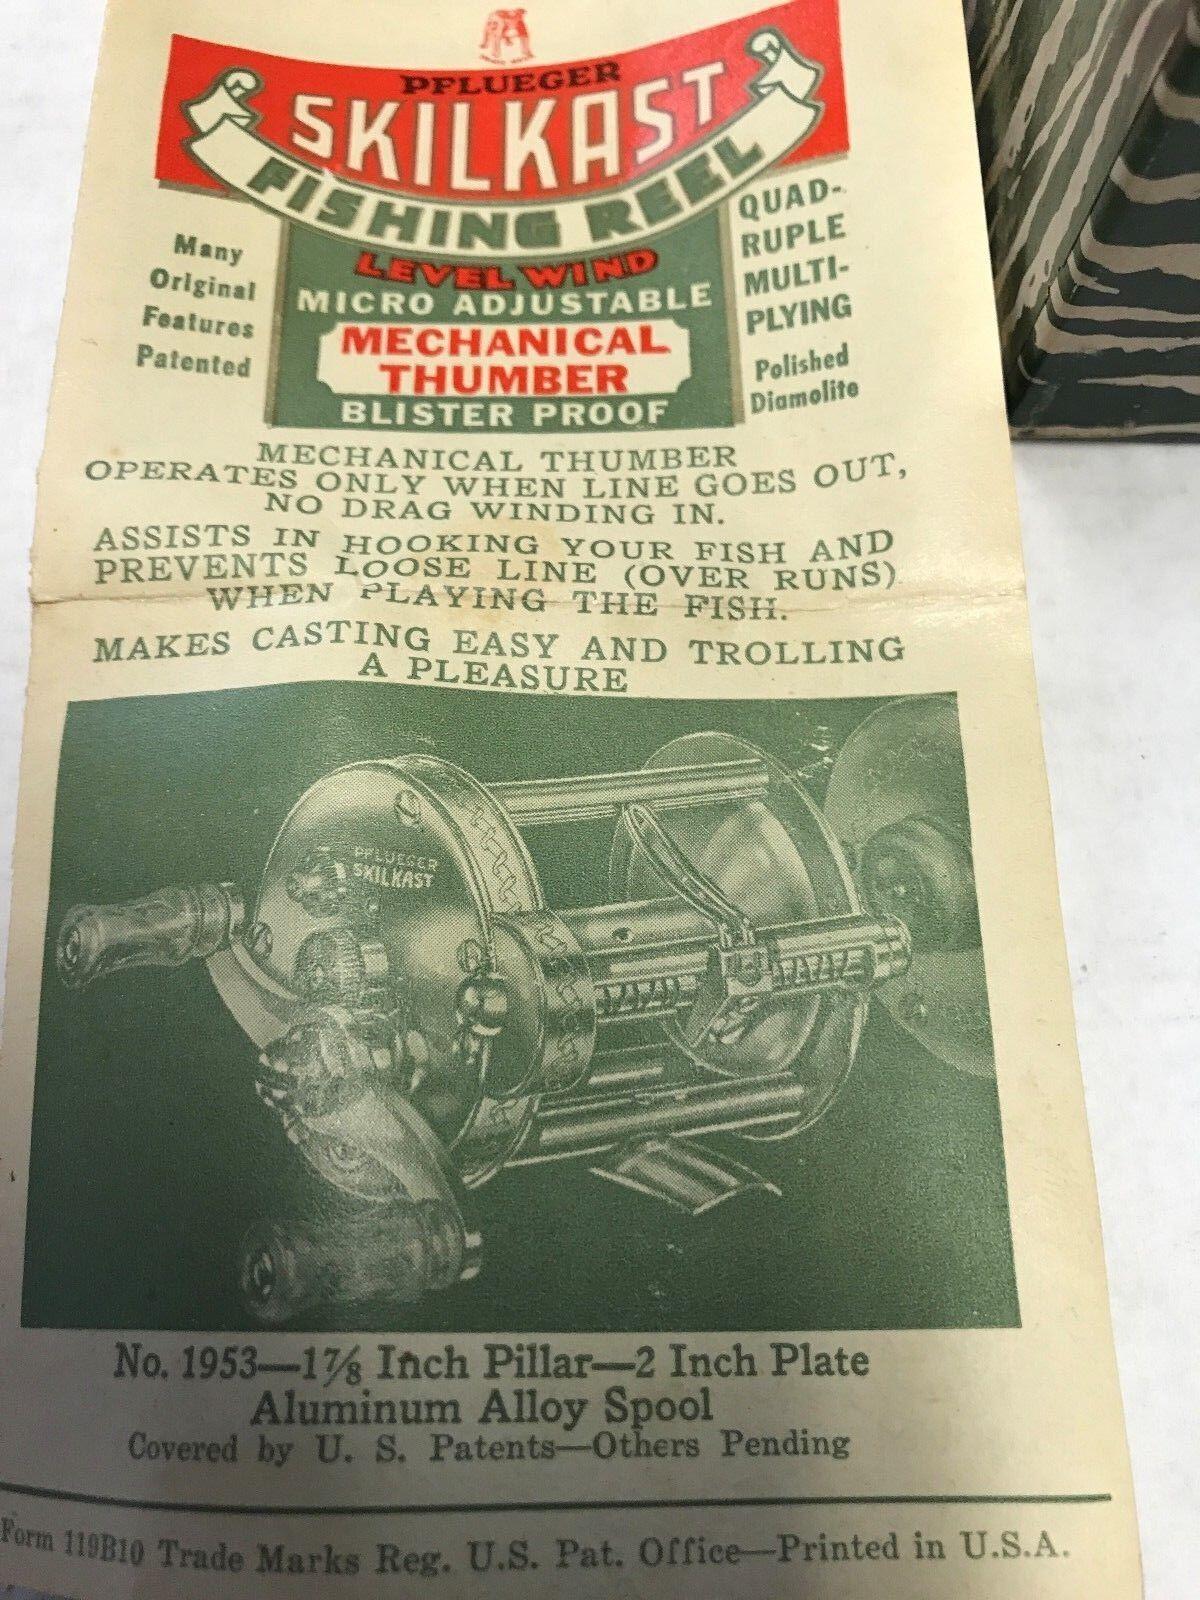 PFLUEGER SKILKAST FISHING REEL    1953 W BOX & PAPERS, 60+ YEARS, AMAZING SHAPE  8caee1